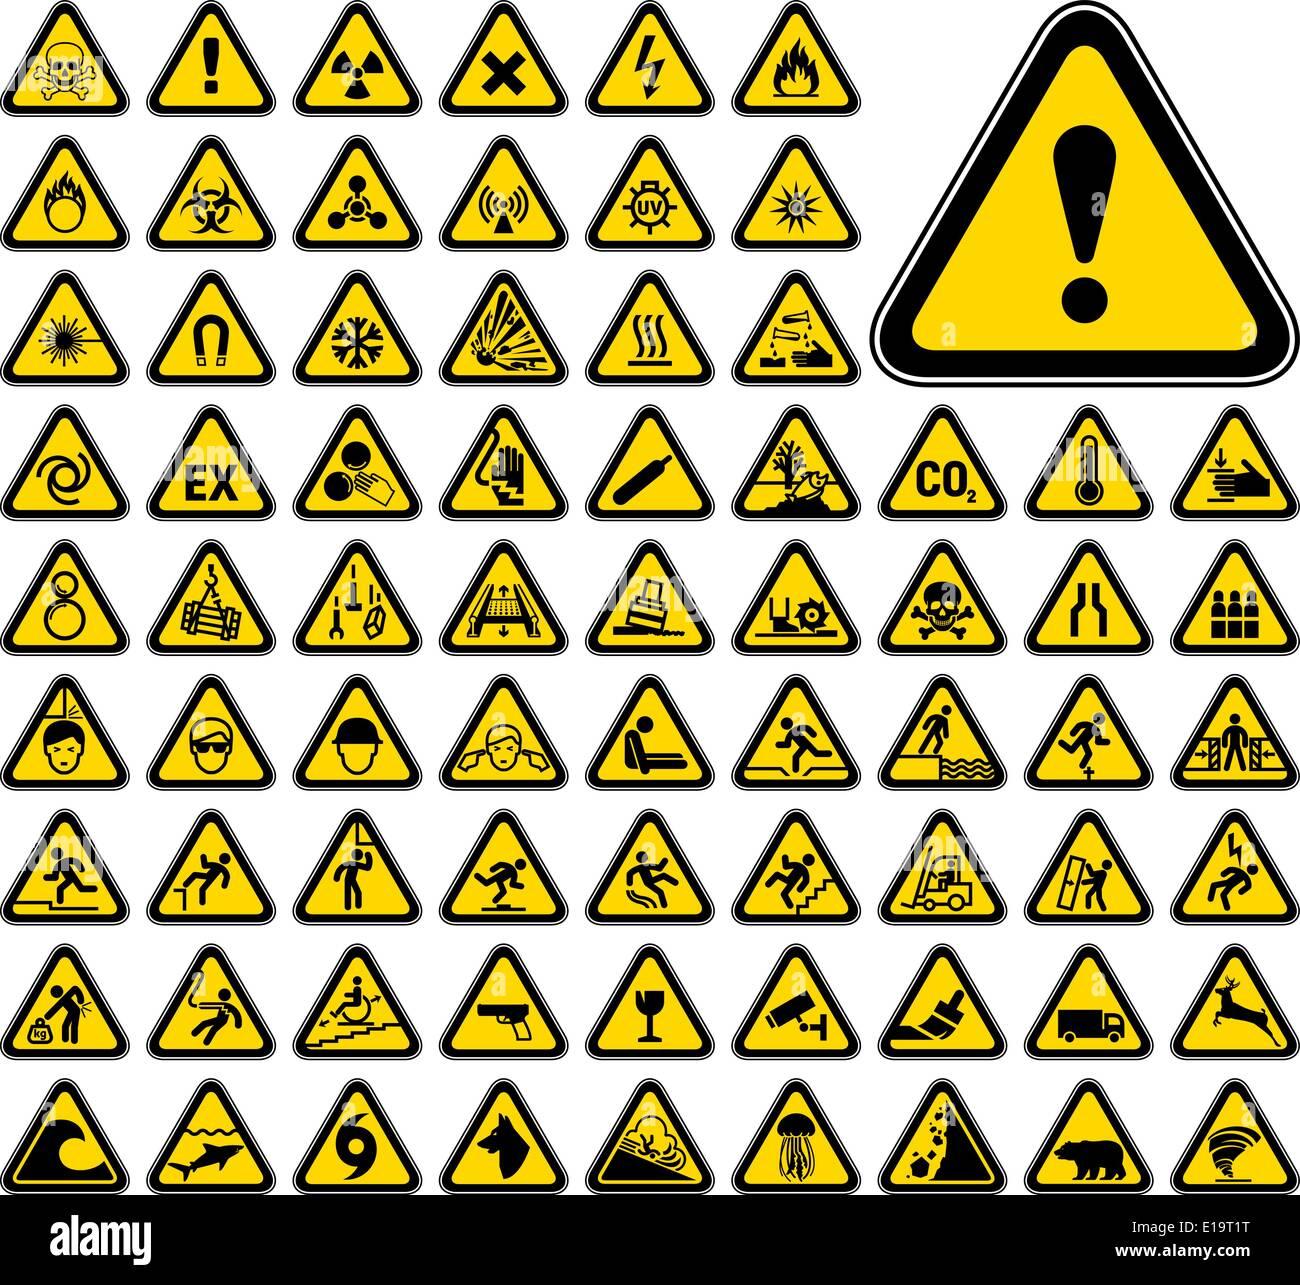 72 triangular warning hazard symbols stock vector art illustration